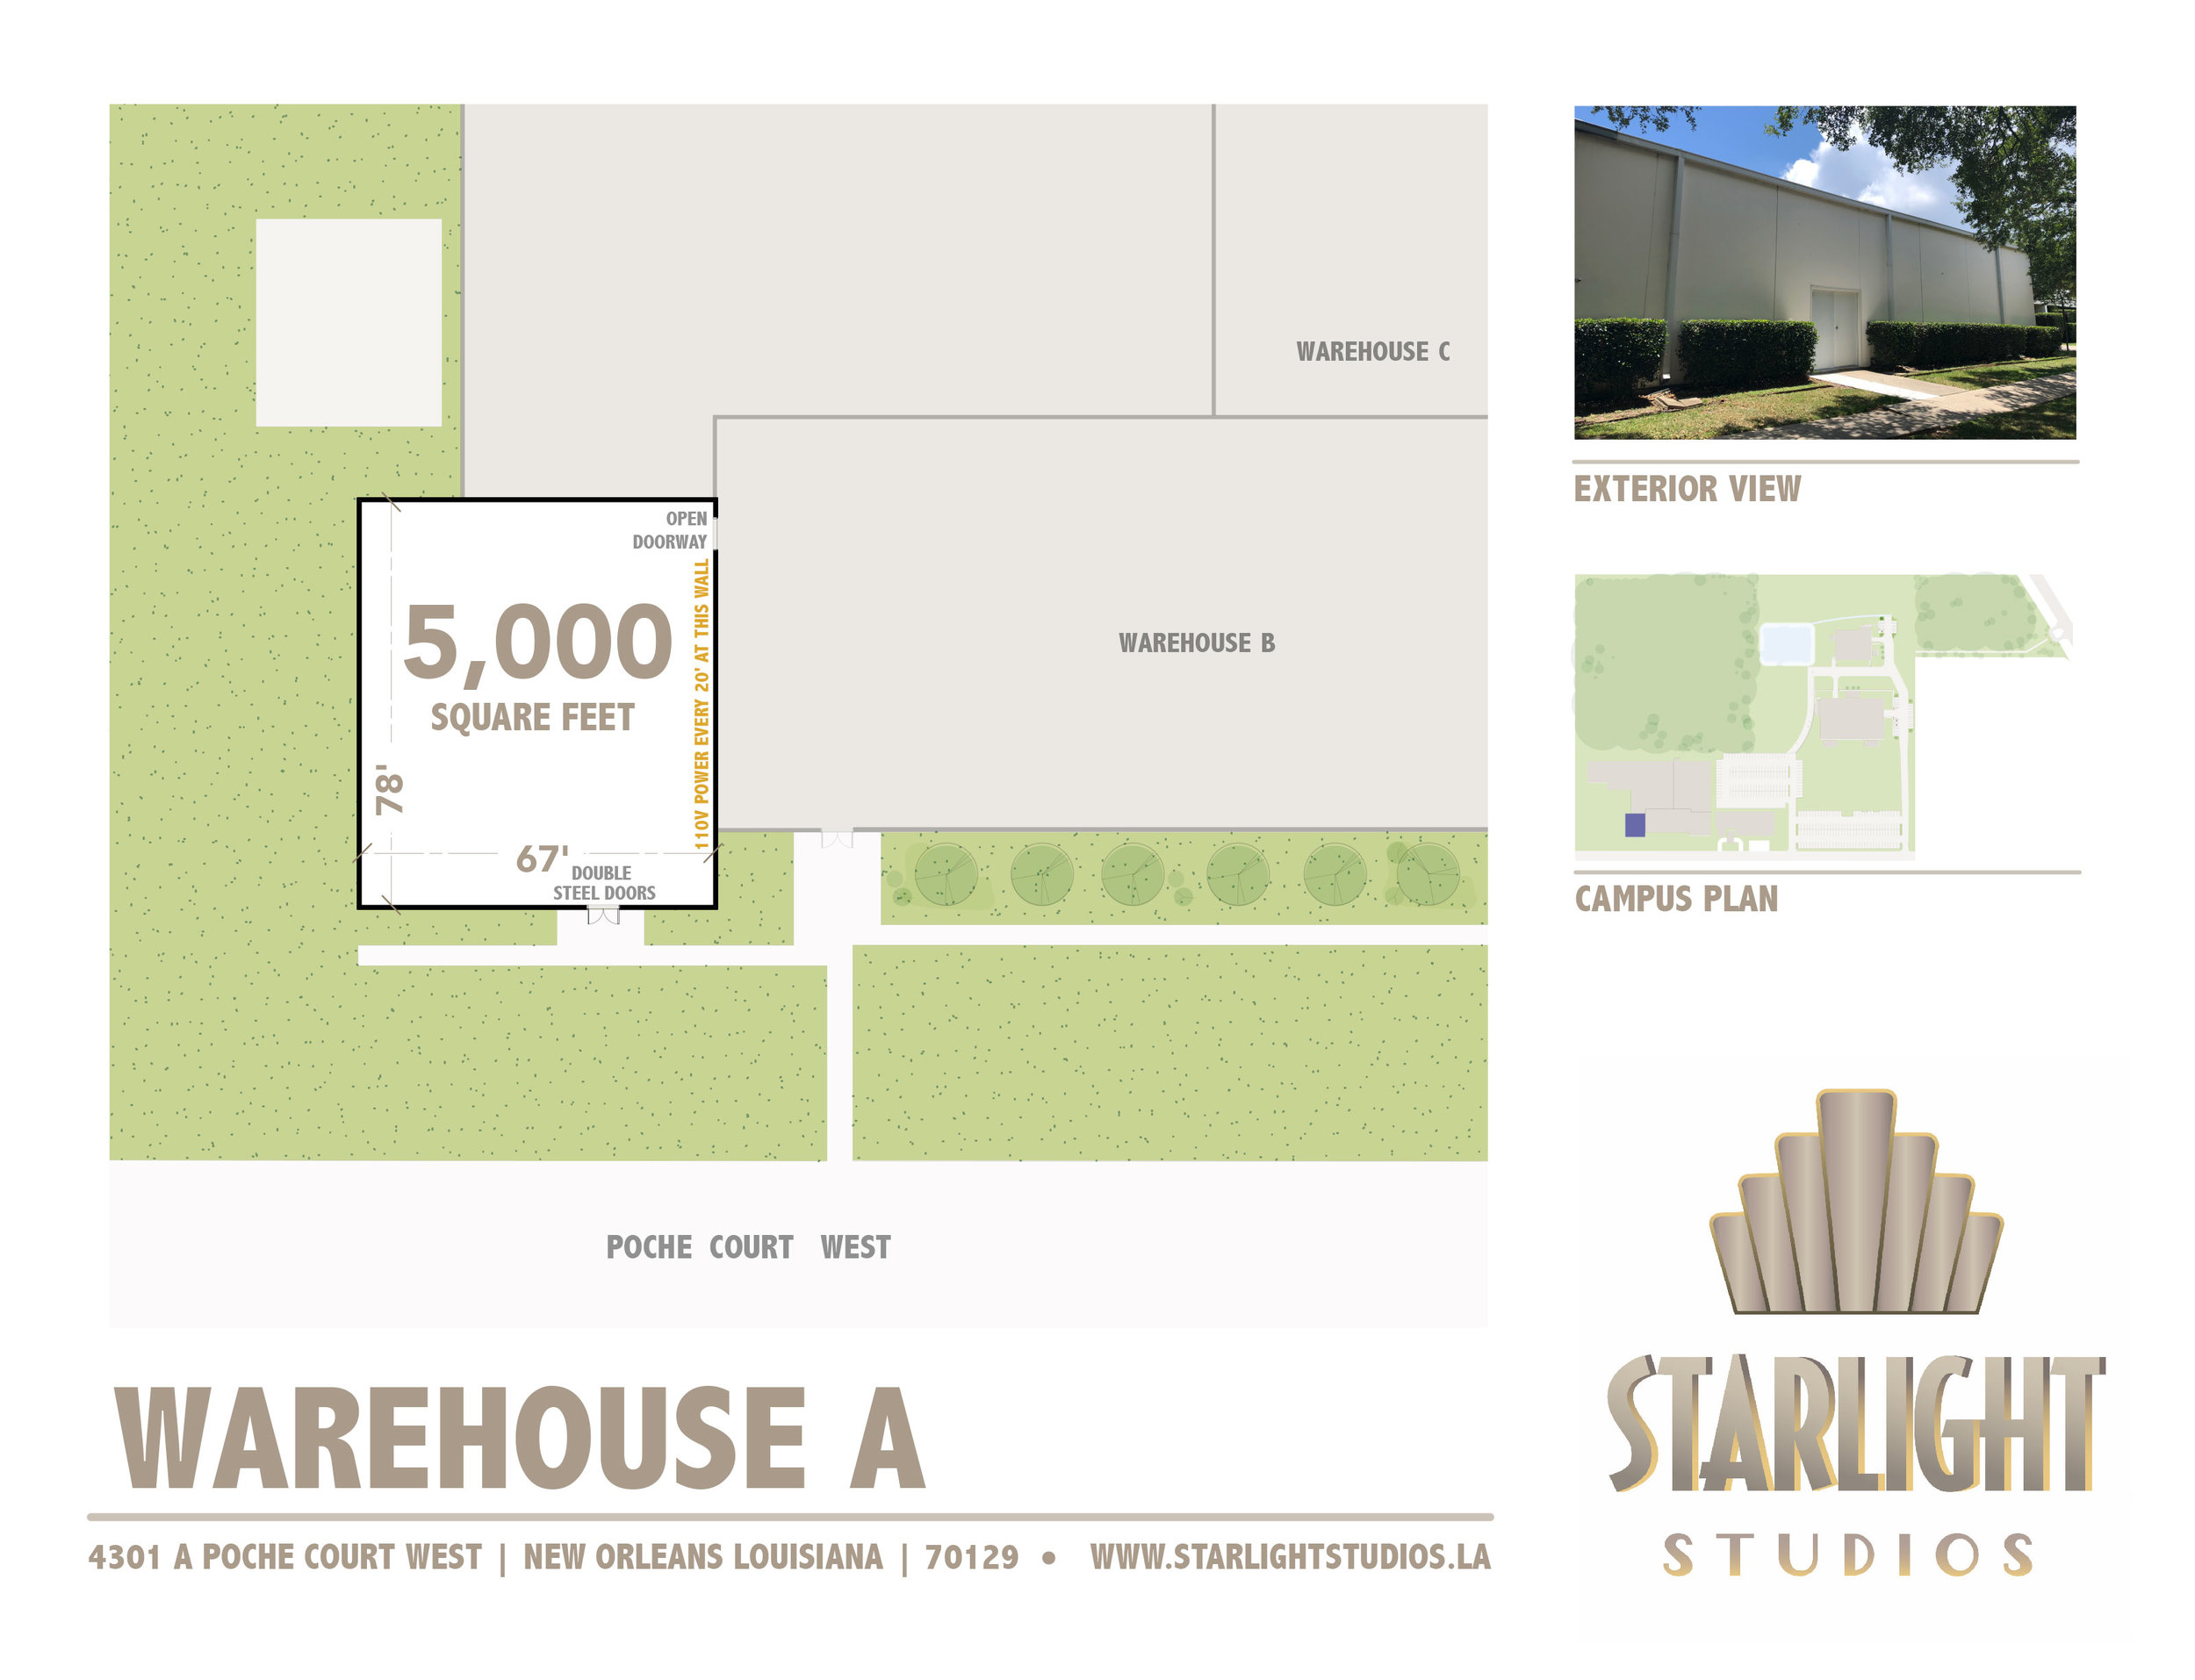 Warehouse A - 5,000 square ft110 volt outletsStreet access